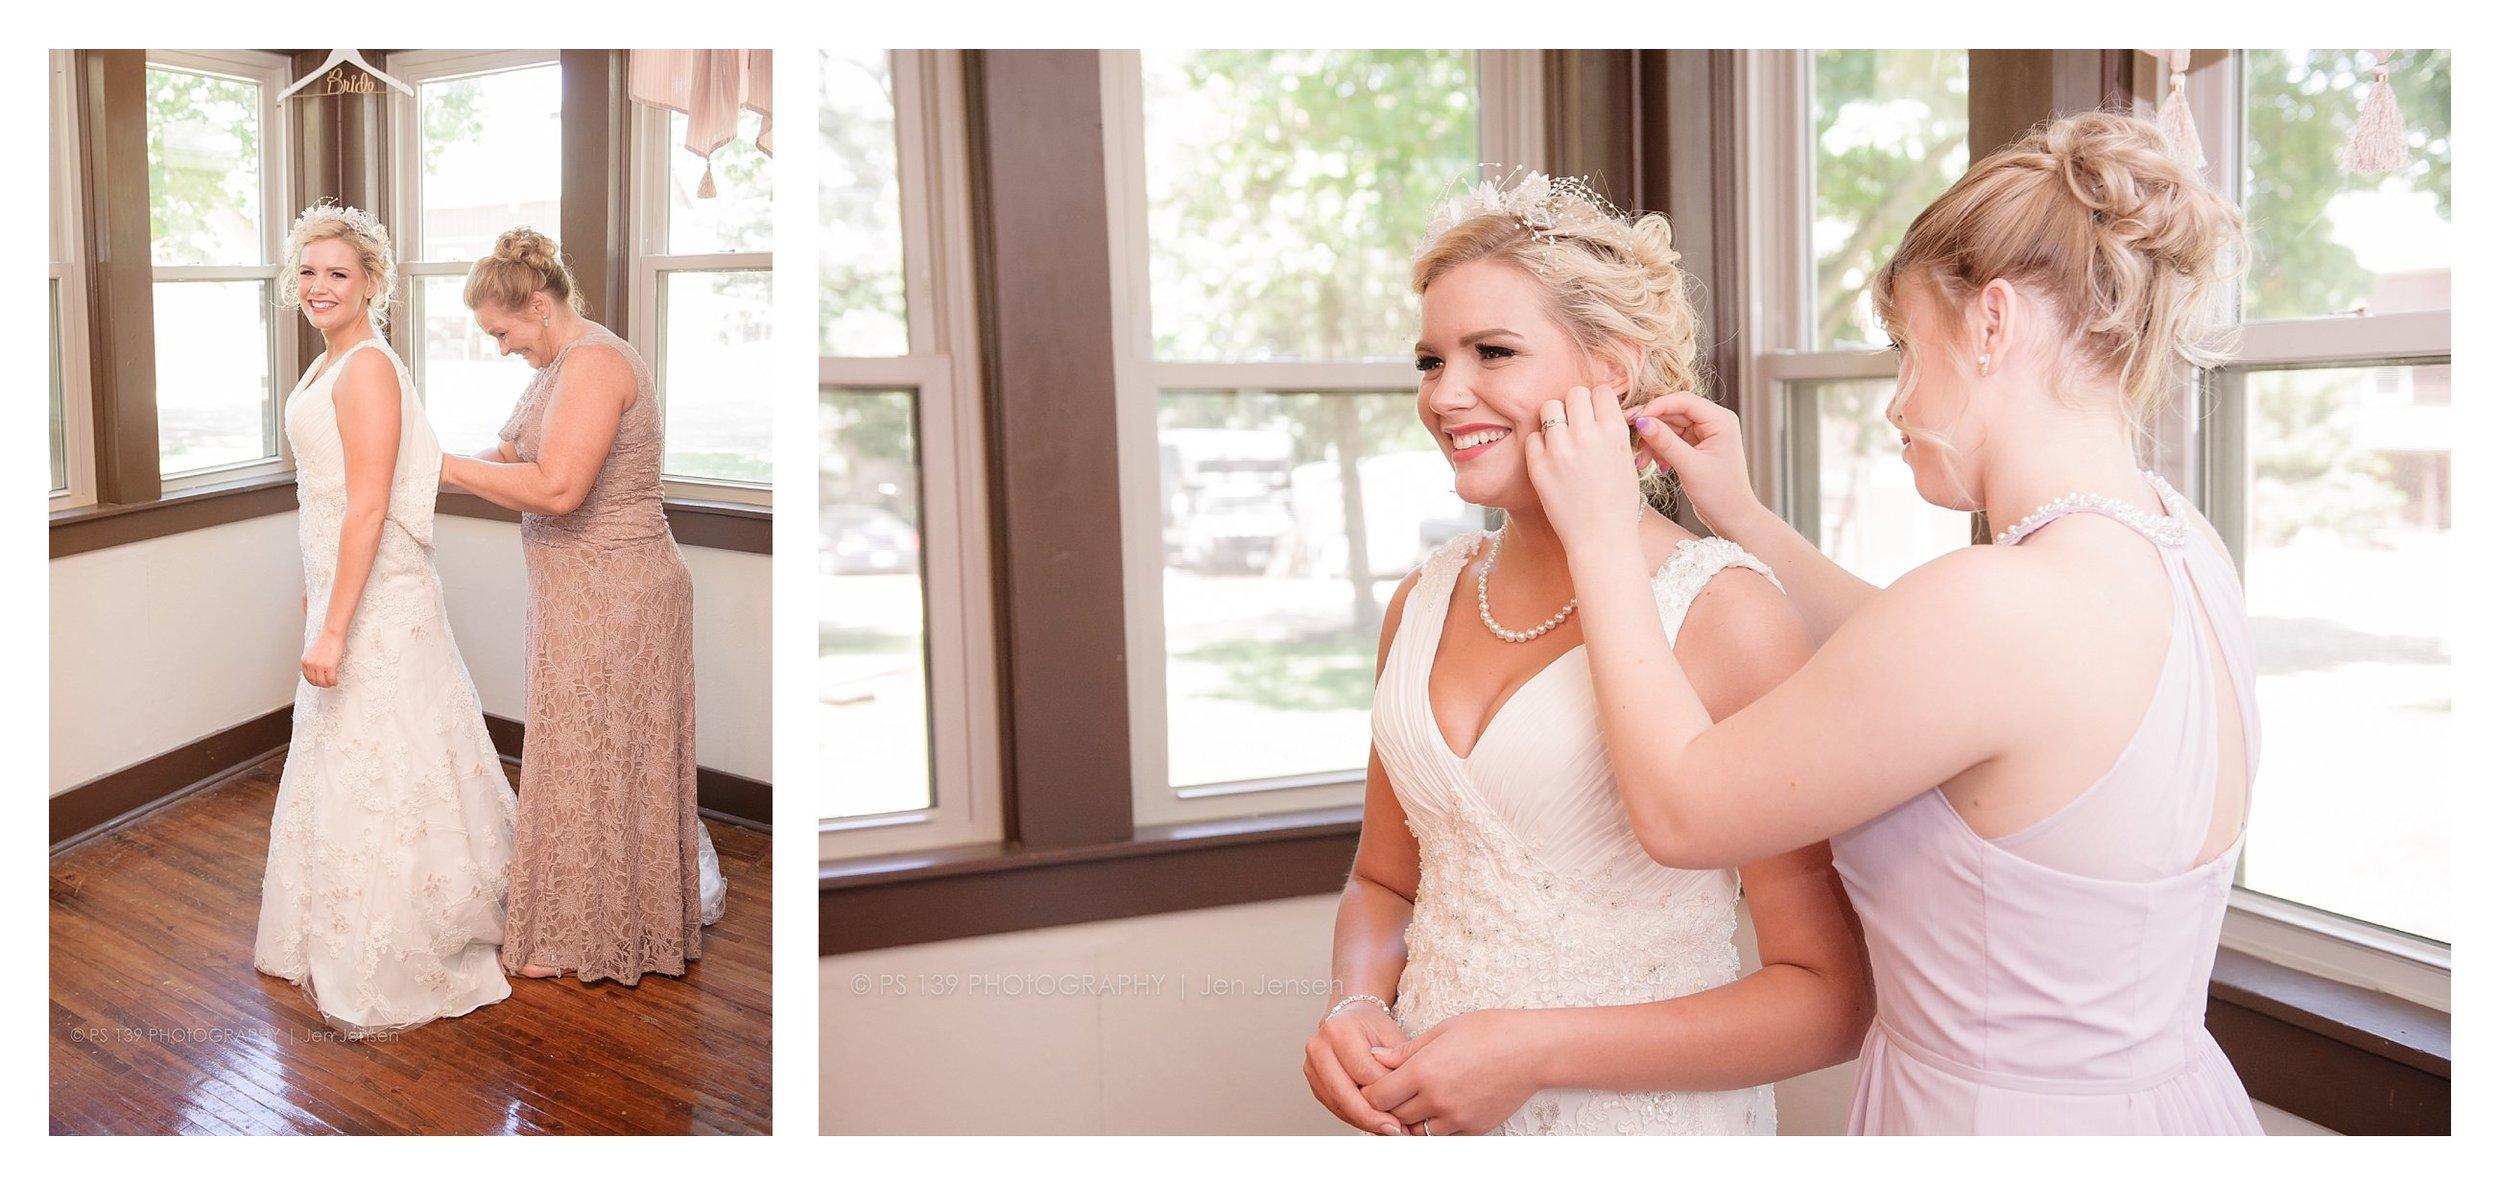 oregon Illinois oak lane farm wisconsin wedding photographer bayfield wi ps 139 photography jen jensen_0241.jpg